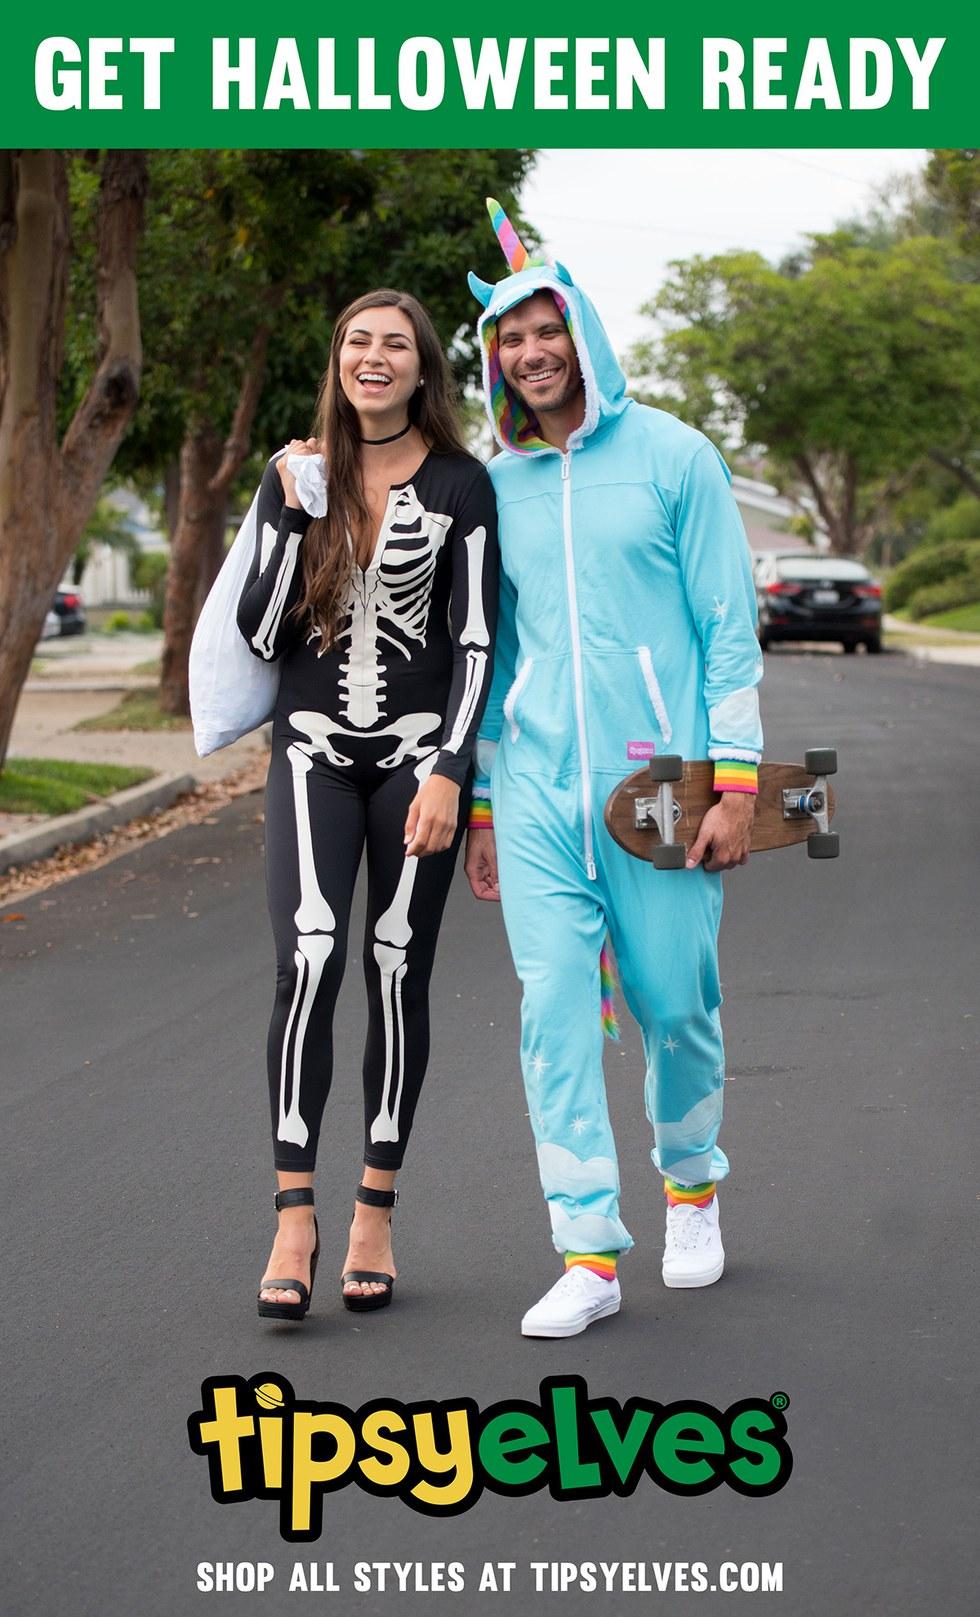 TIPSY ELVES Halloween Costumes